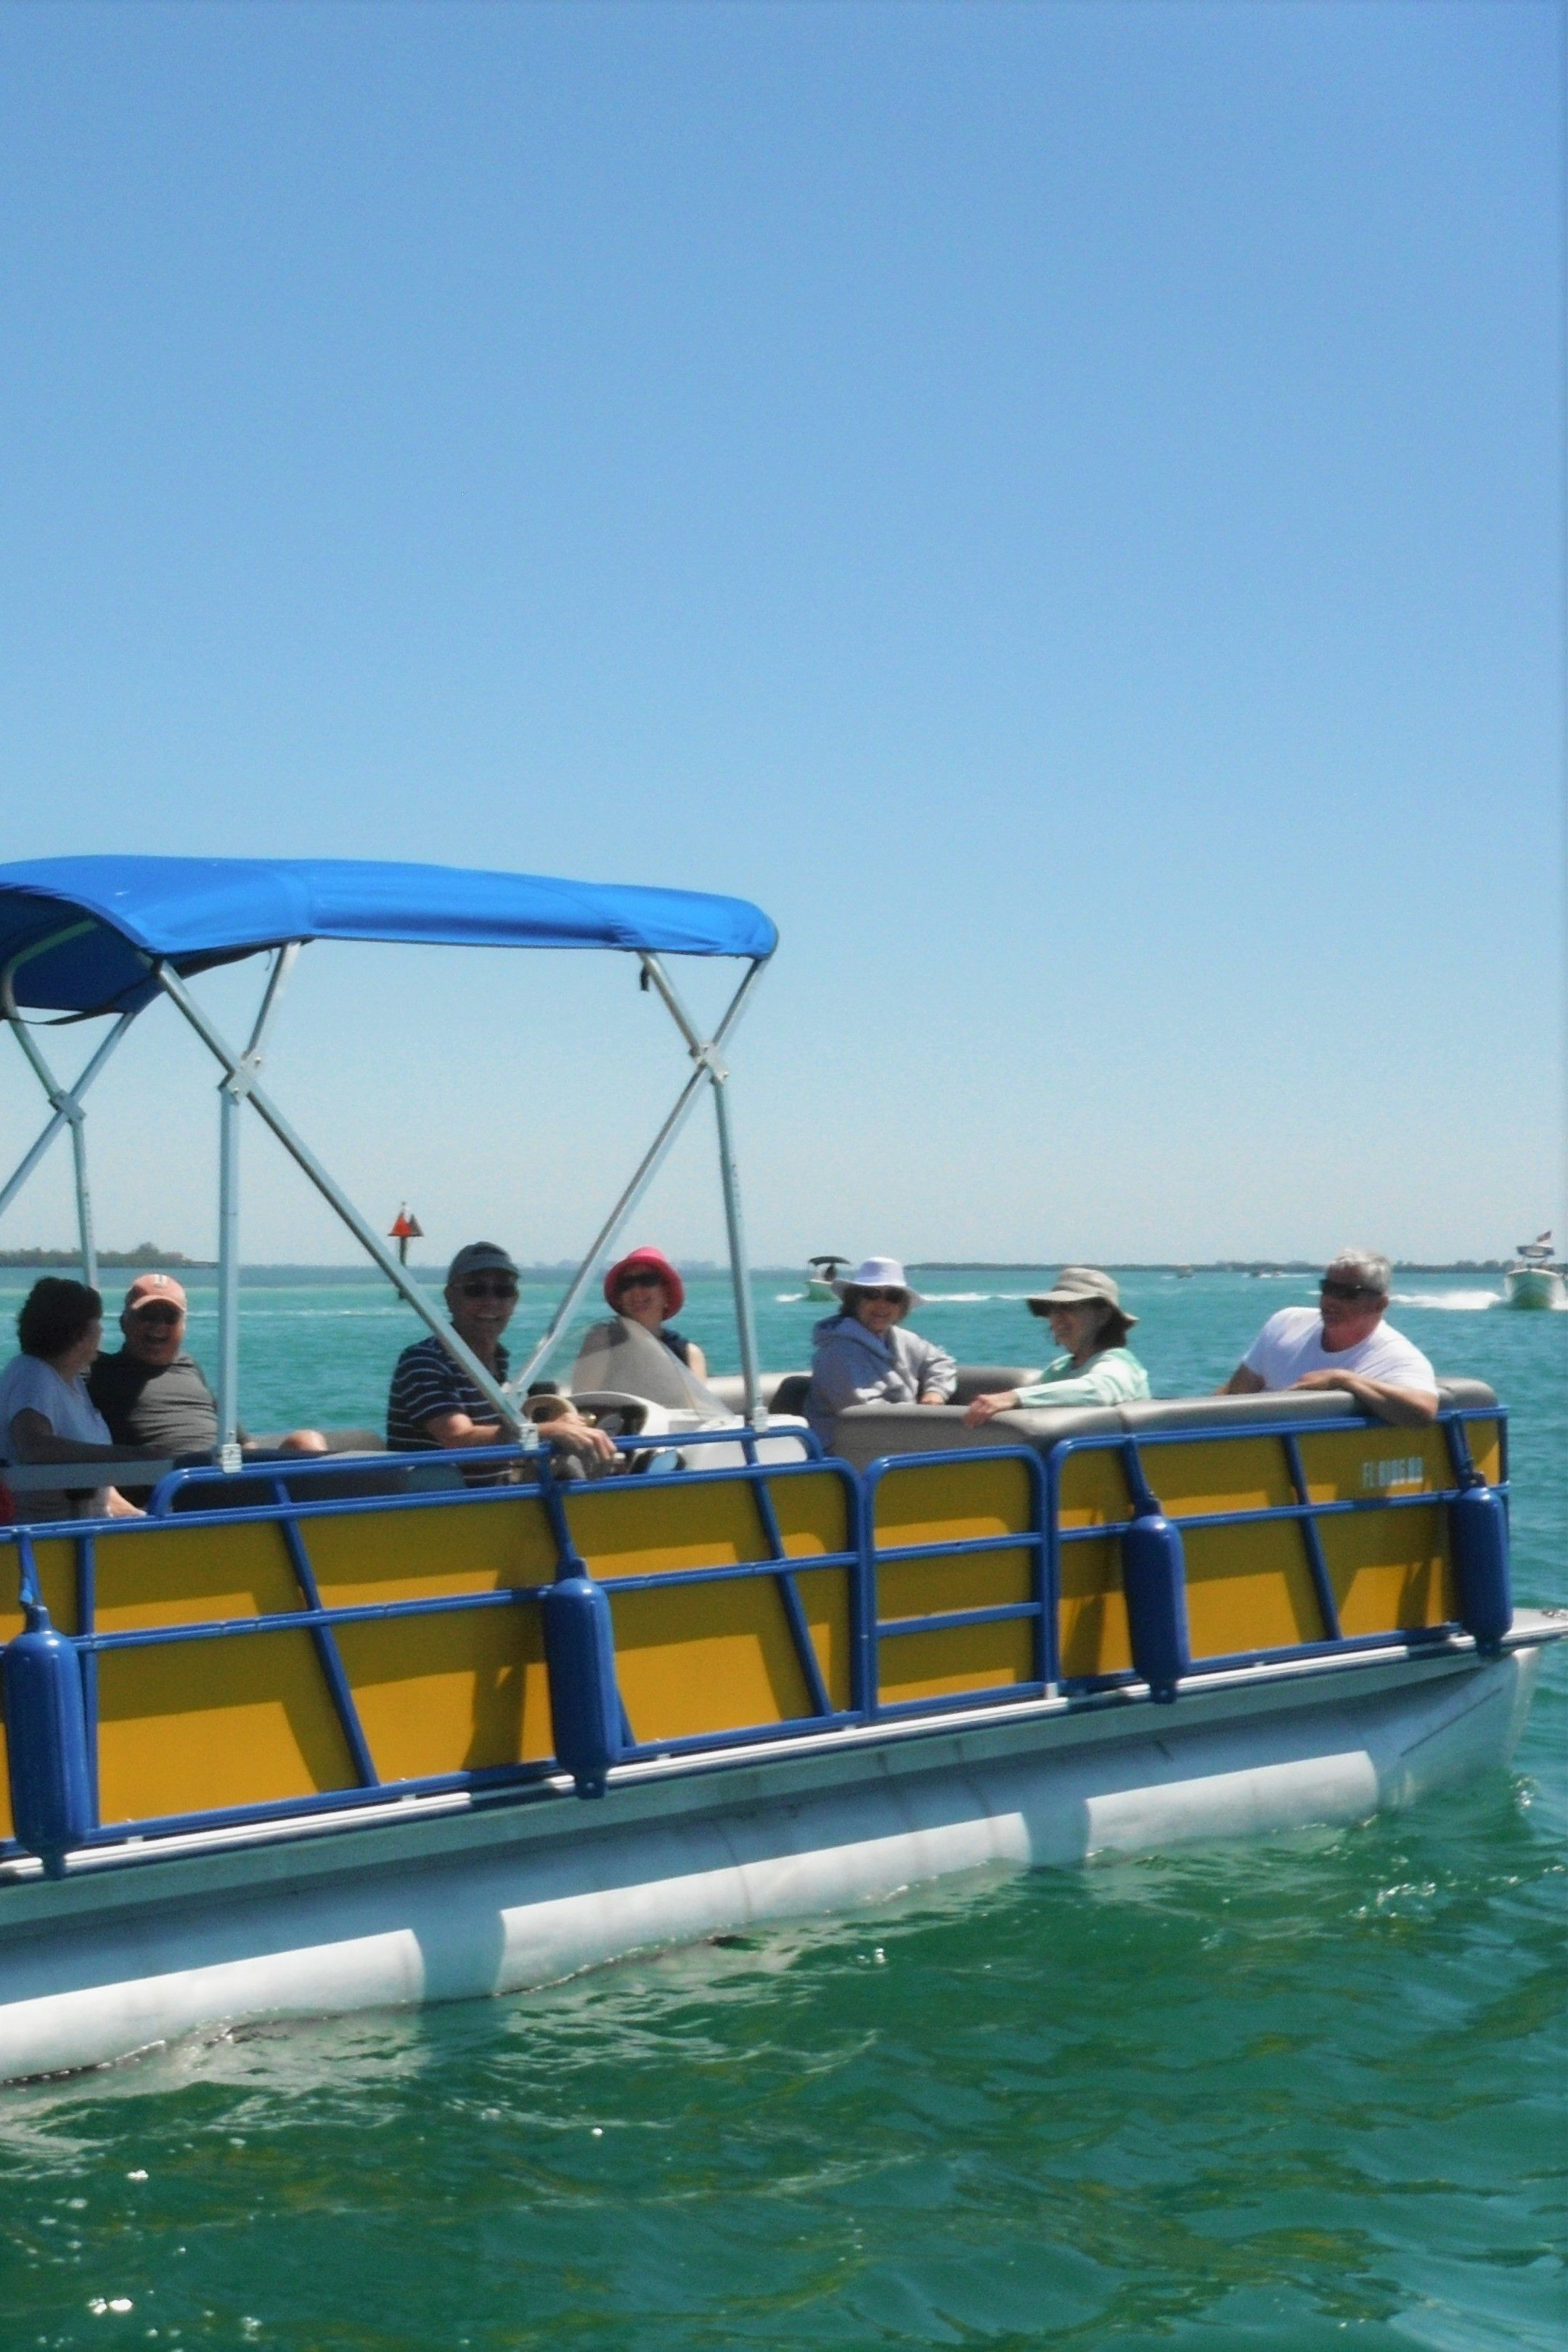 24 Pontoon Full Day Boat Rental Pontoon Boat Boat